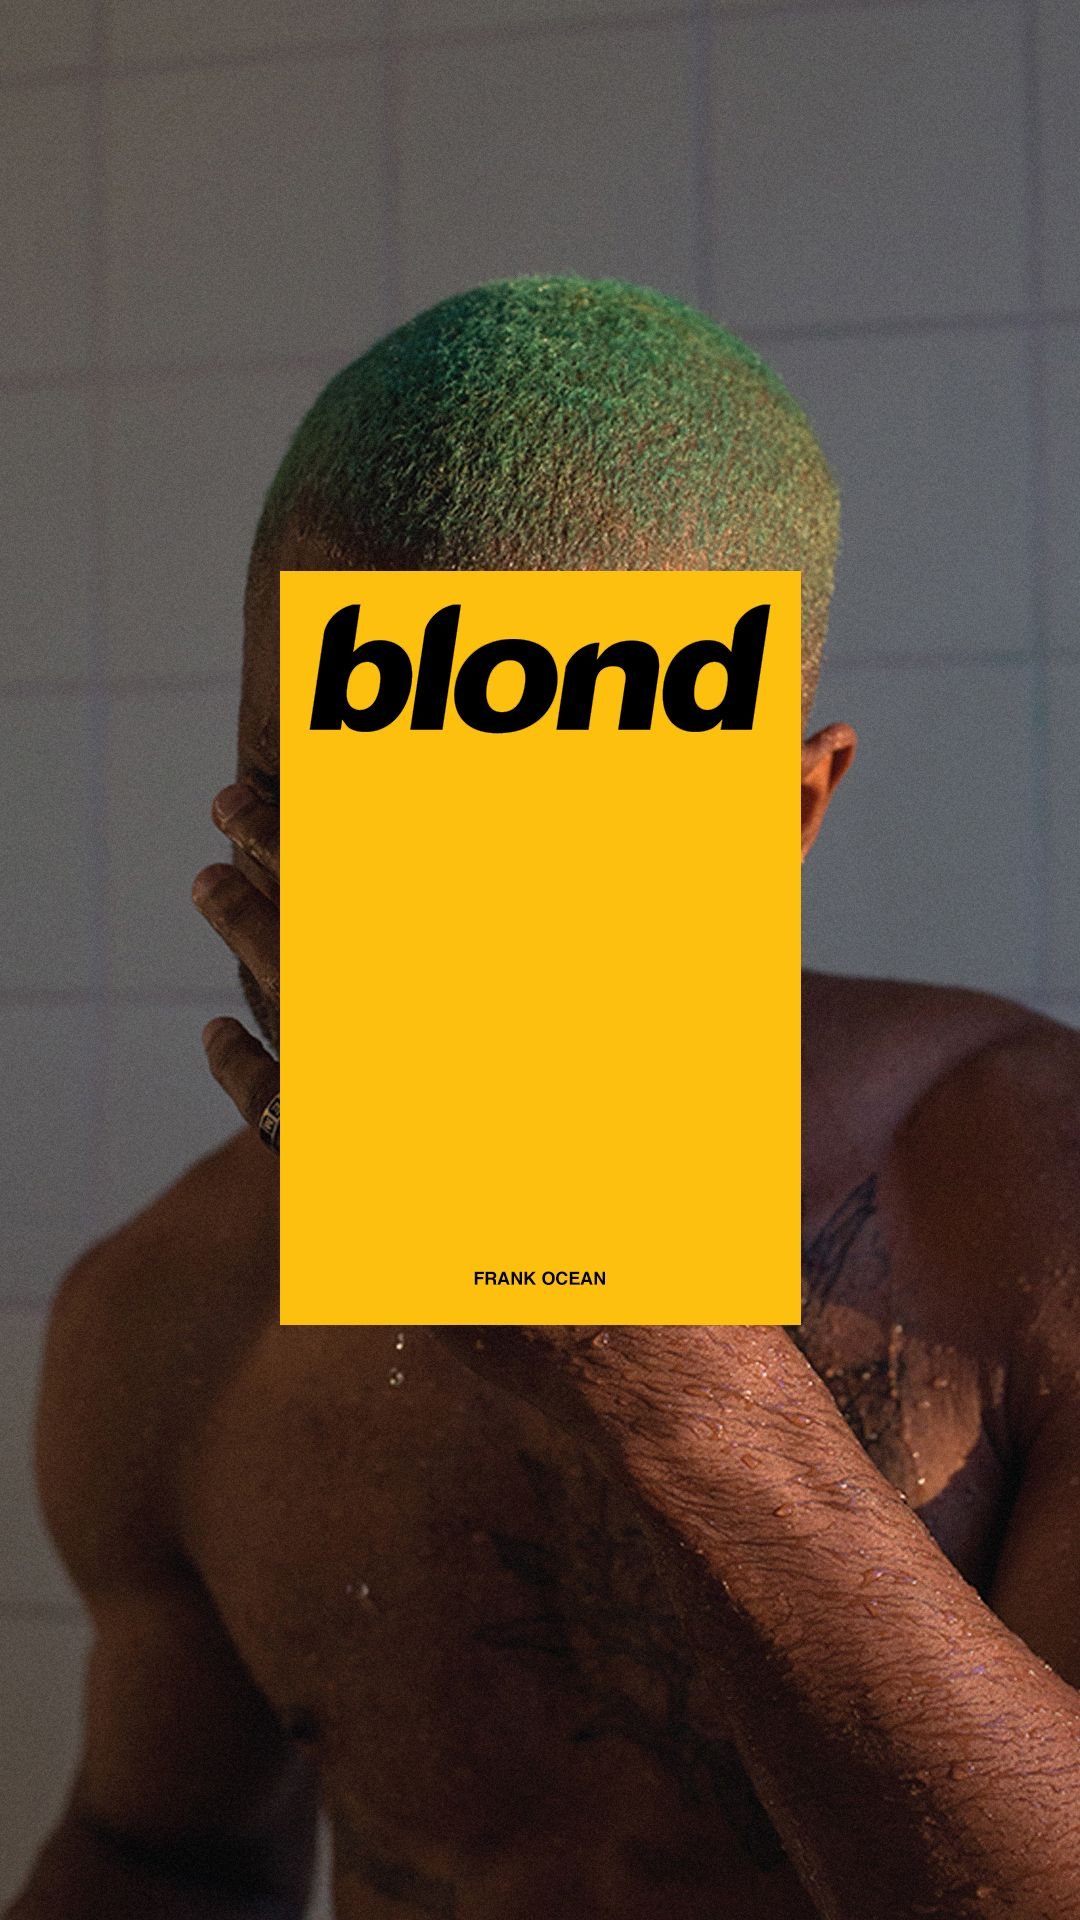 Frank Ocean Wallpaper Iphone X Frank Ocean Blond Poster 1 Frank Графика